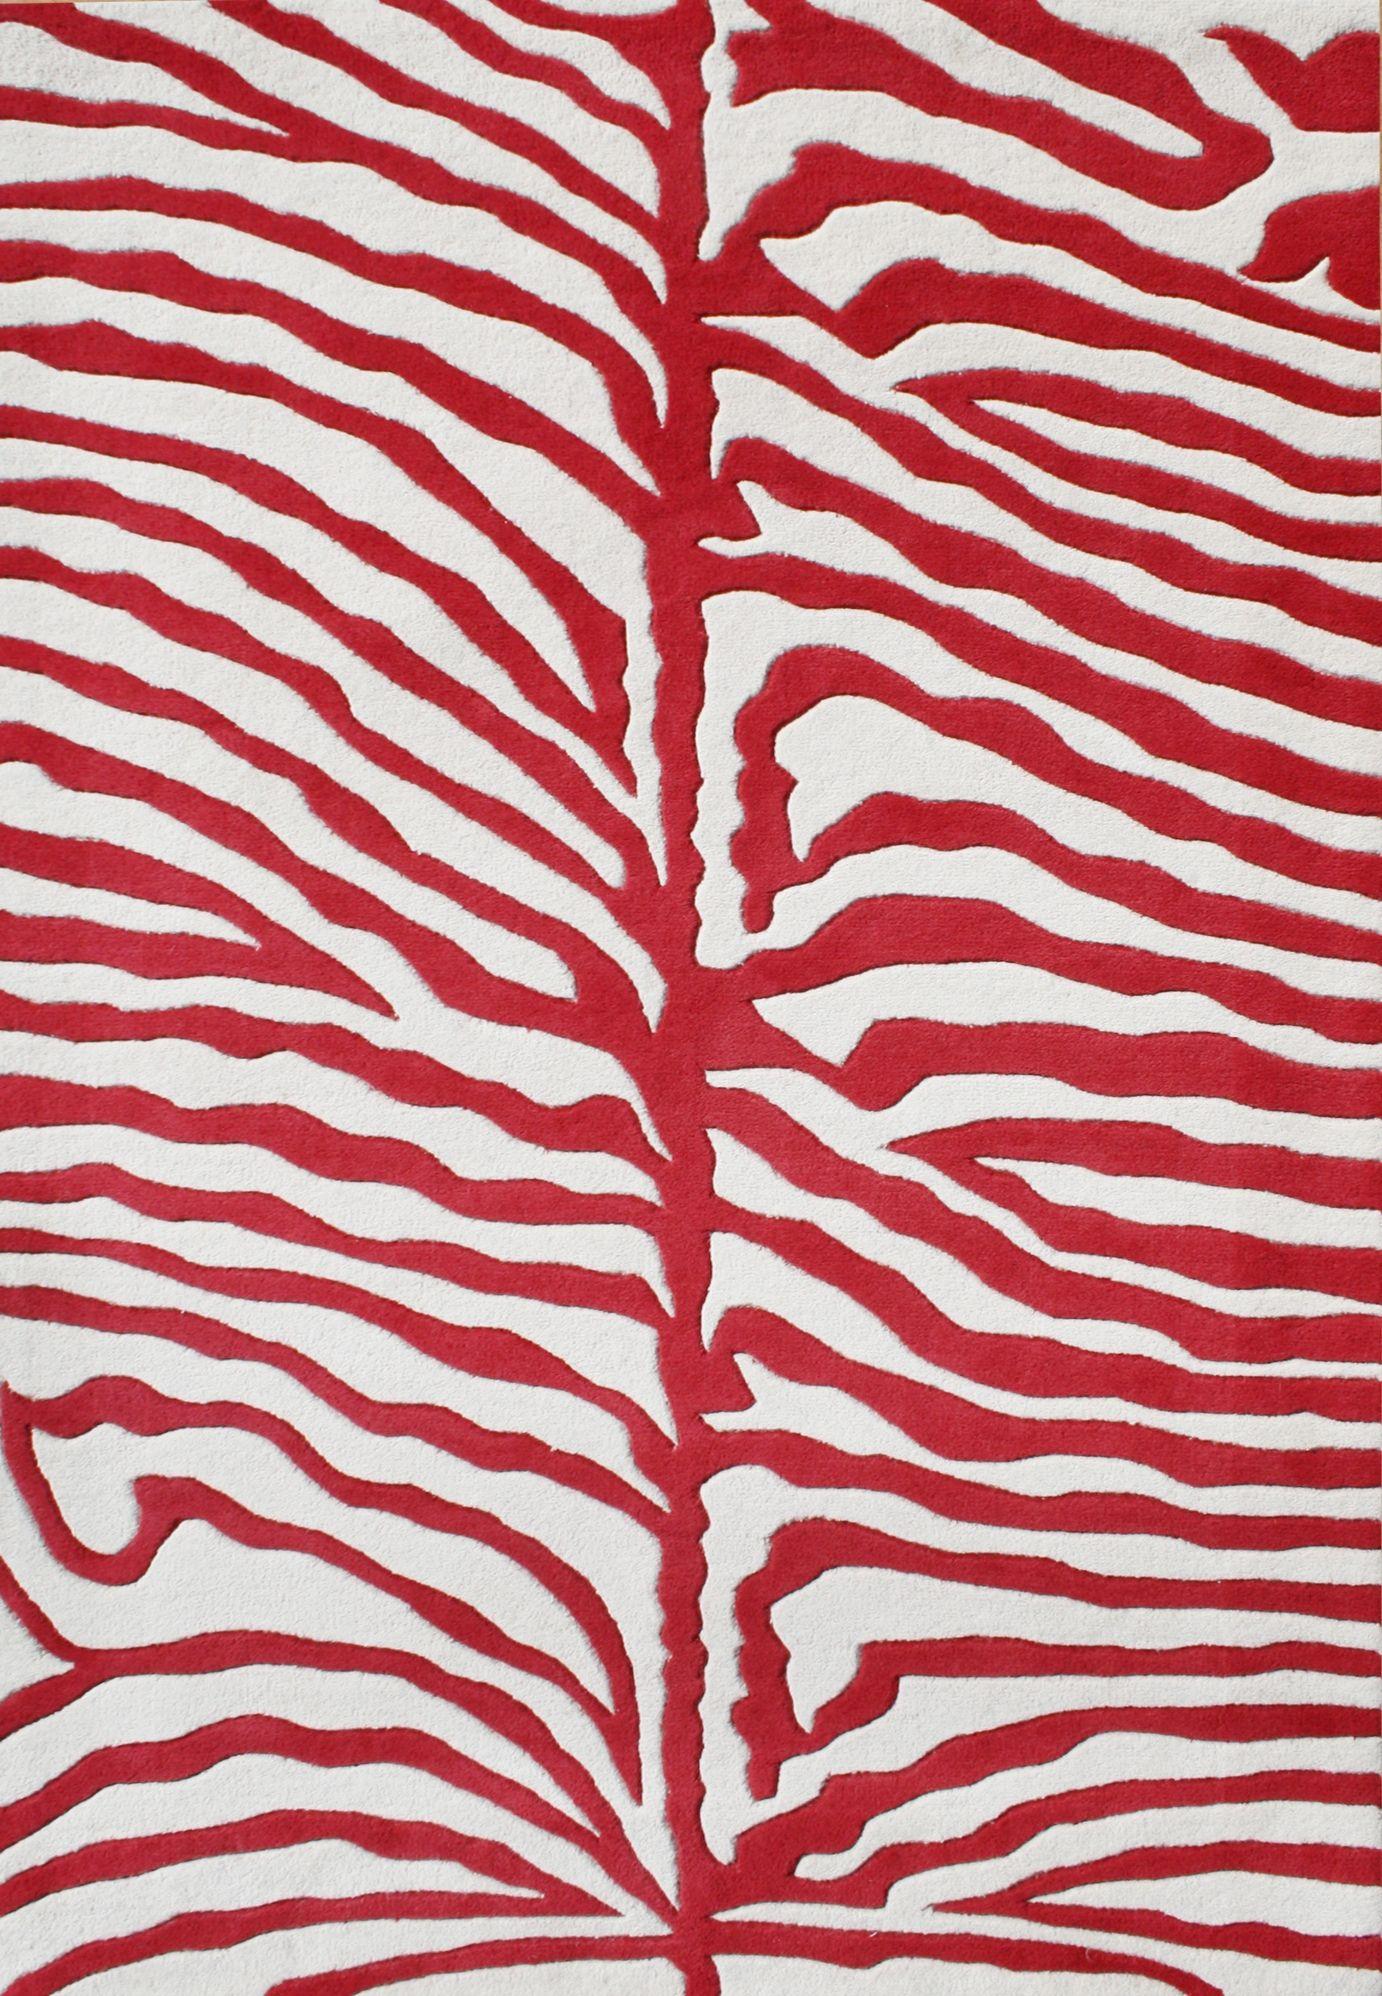 Animal Print Red